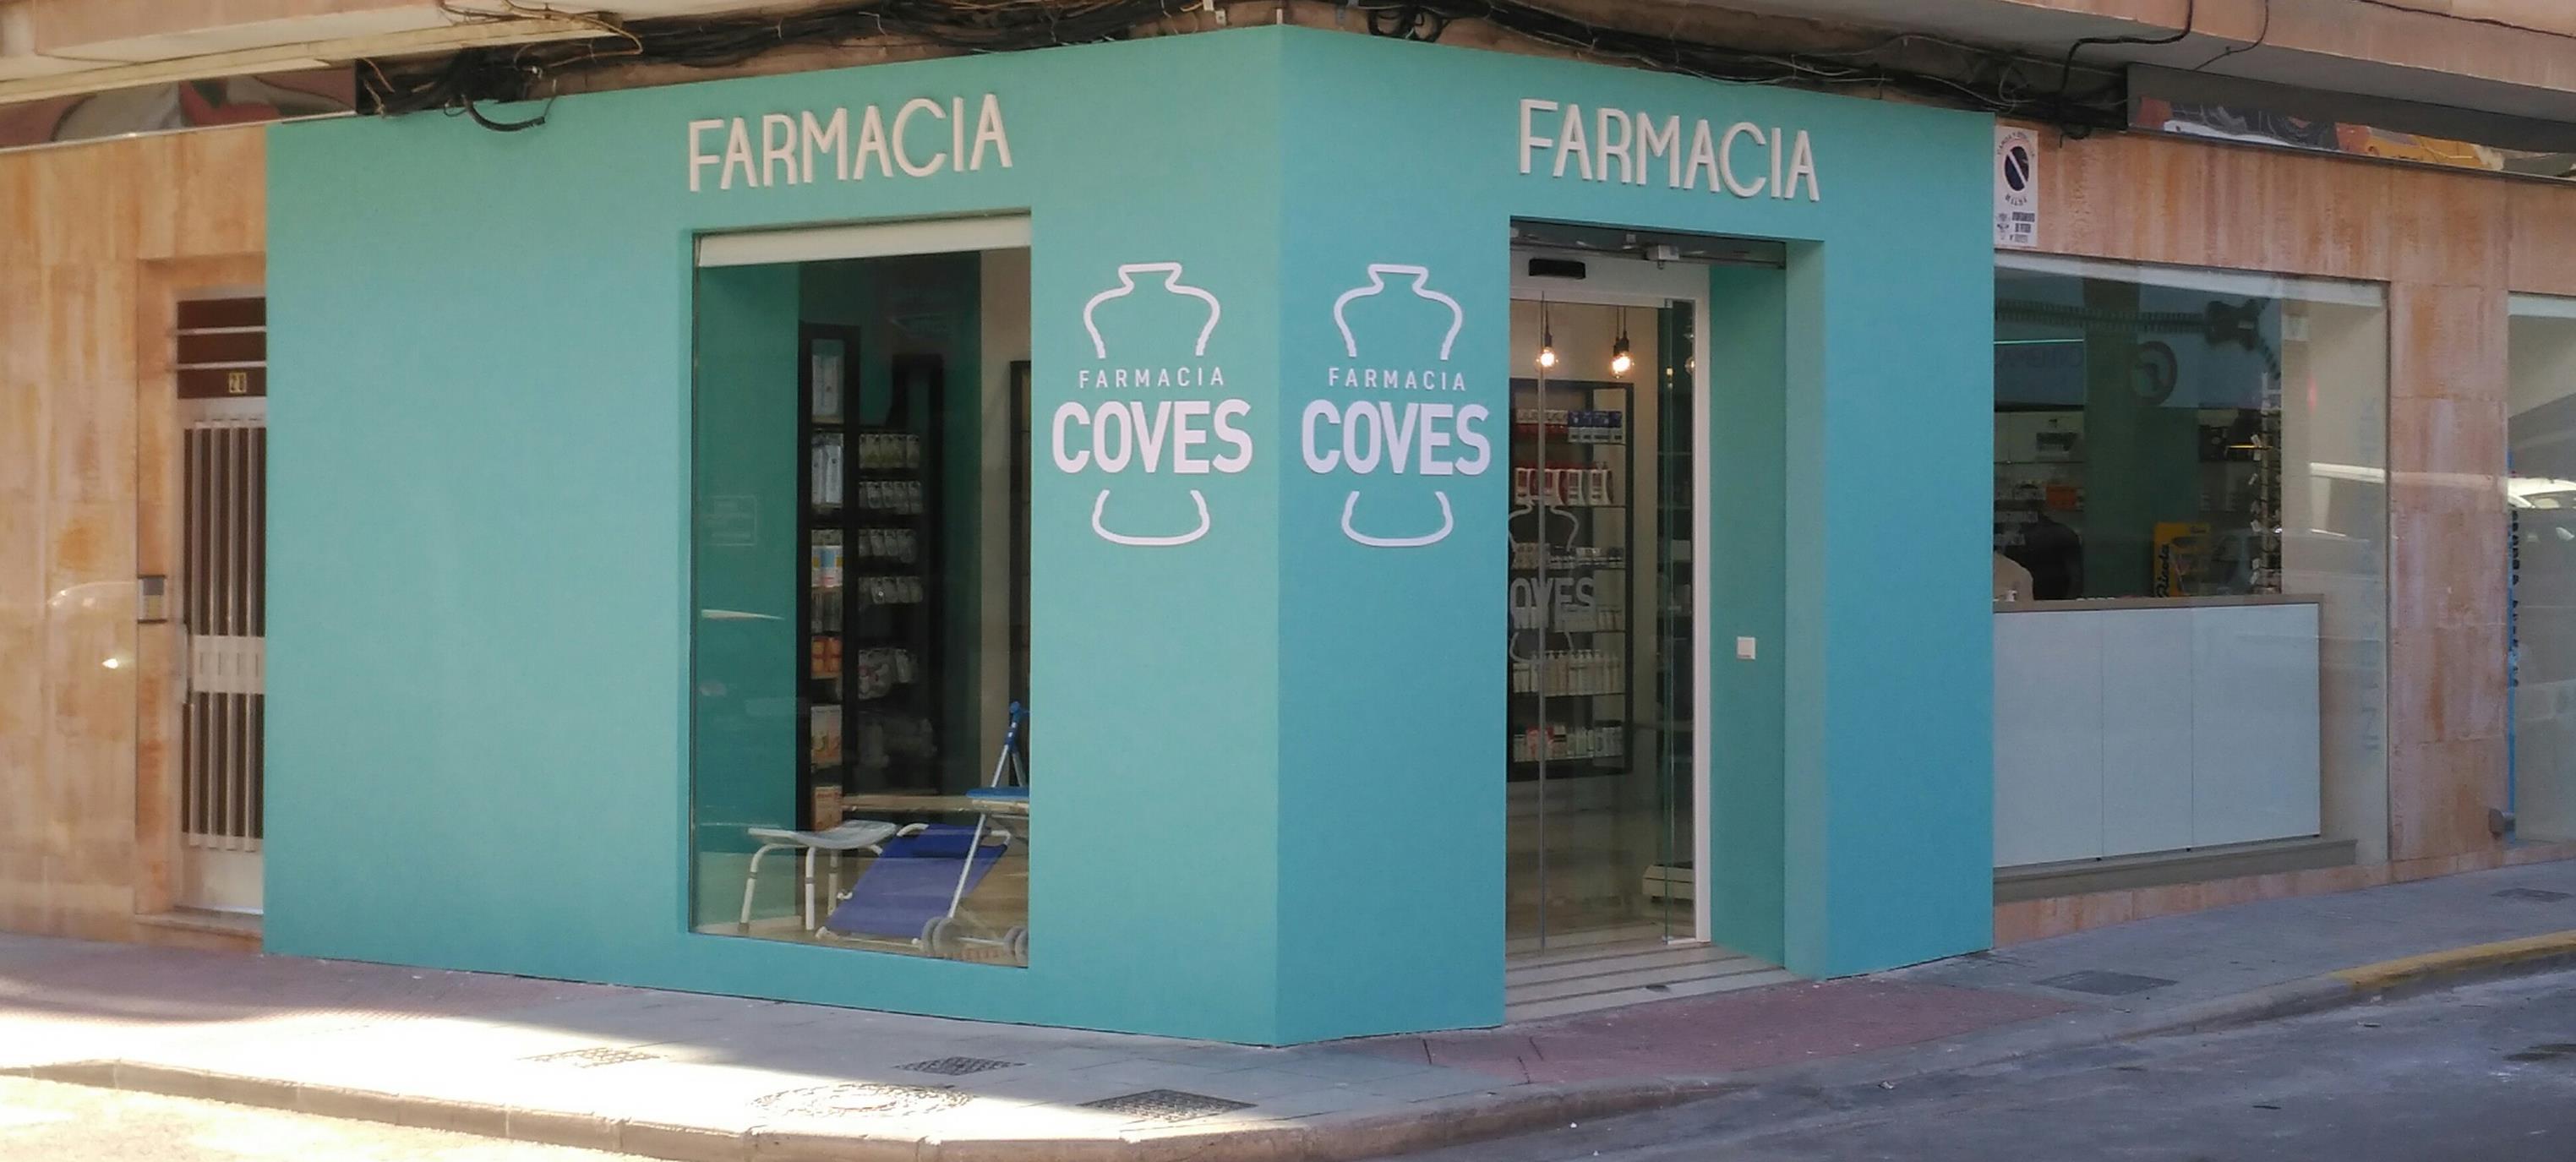 Carlos Coves Farmacia